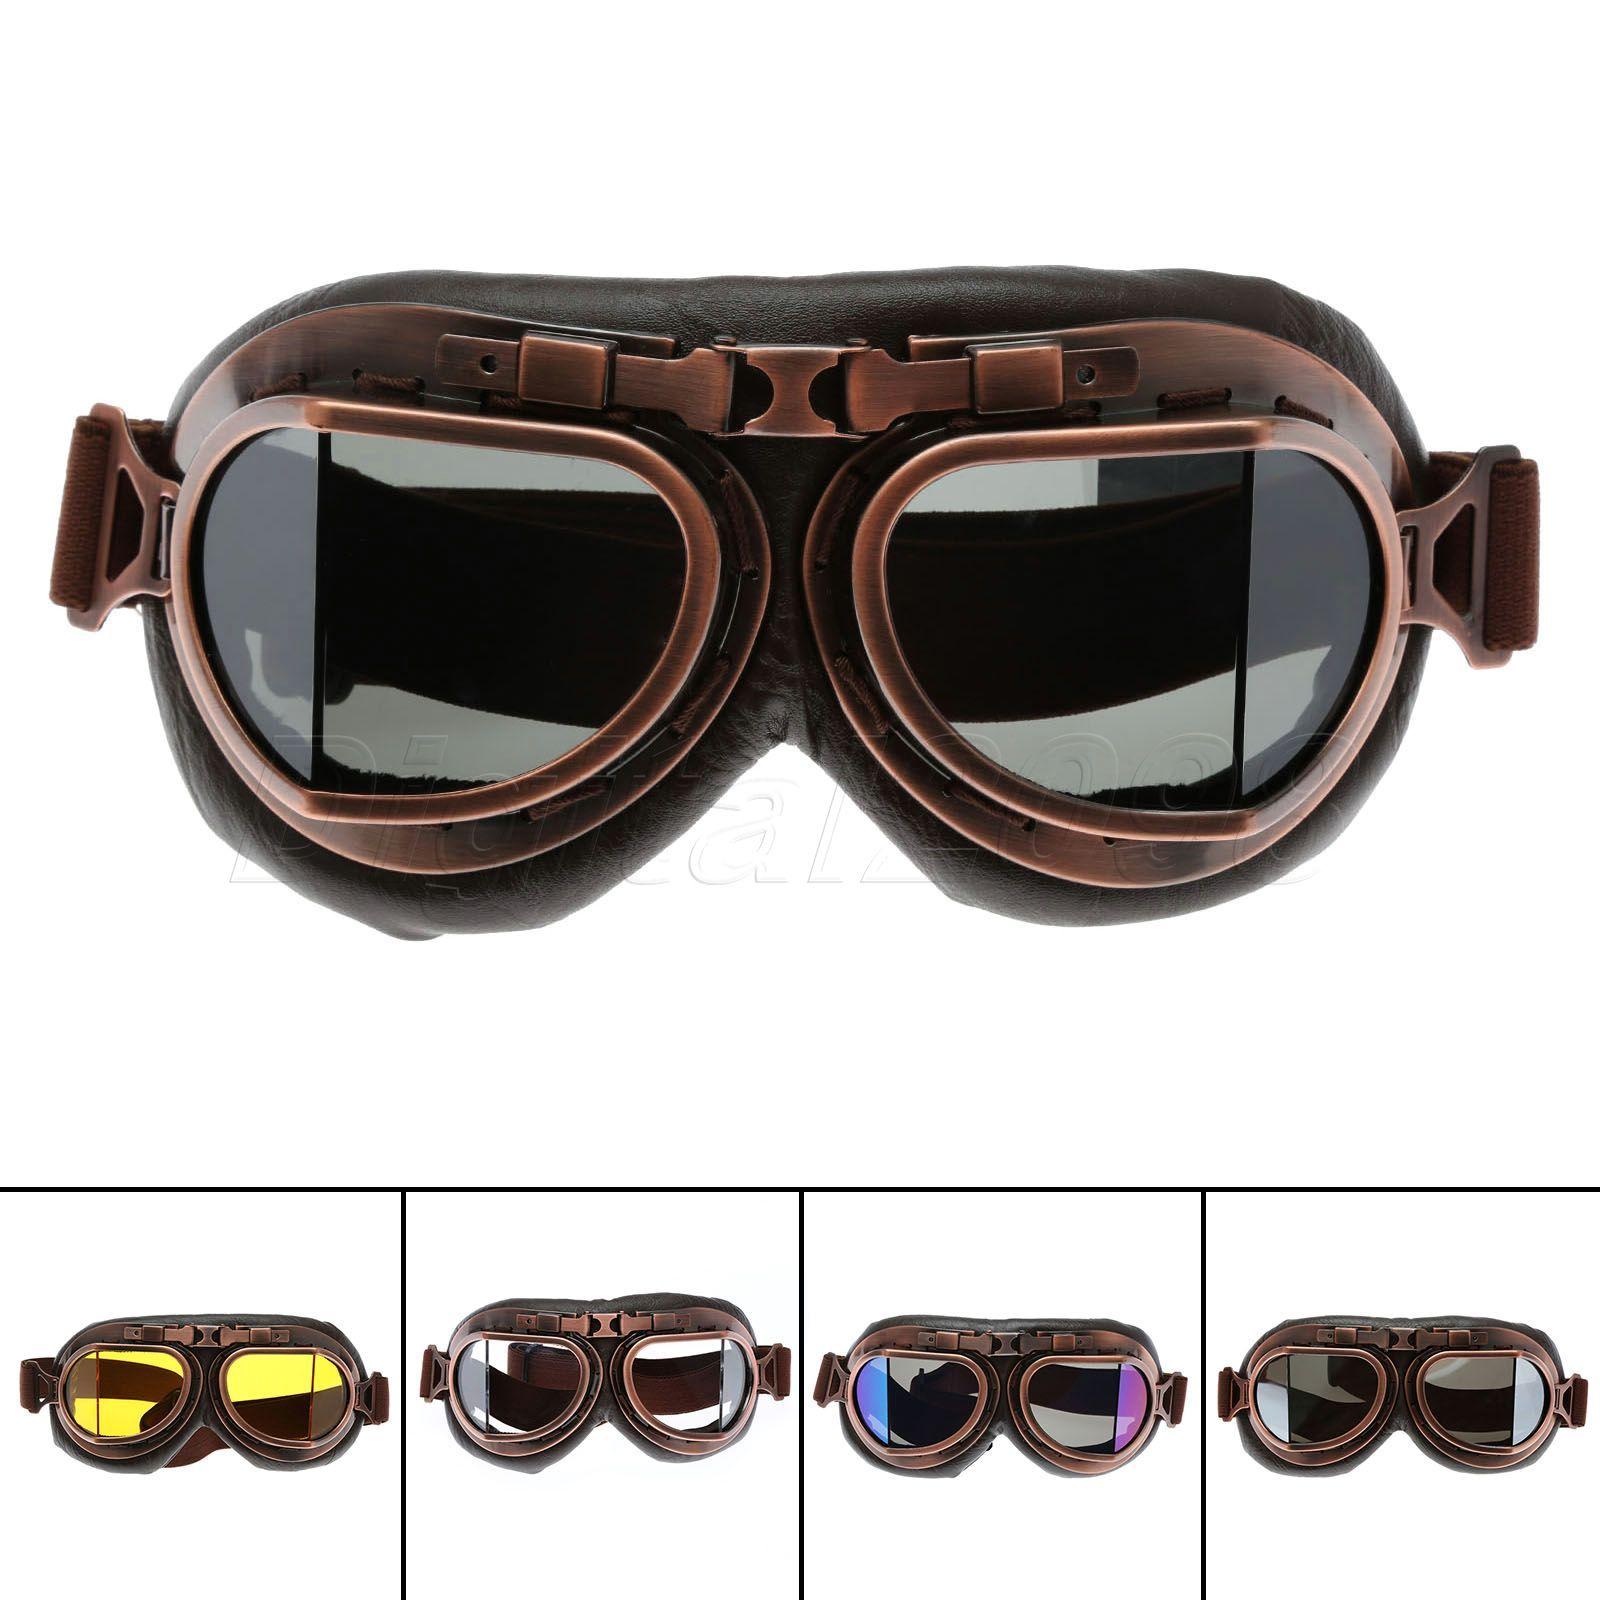 Yetaha WWII RAF Vintage Motorcycle Goggles Harley Motocross Aviator Pilot Cruiser Glasses ATV Dirt <font><b>Bike</b></font> Motor Helmet 5 Colors